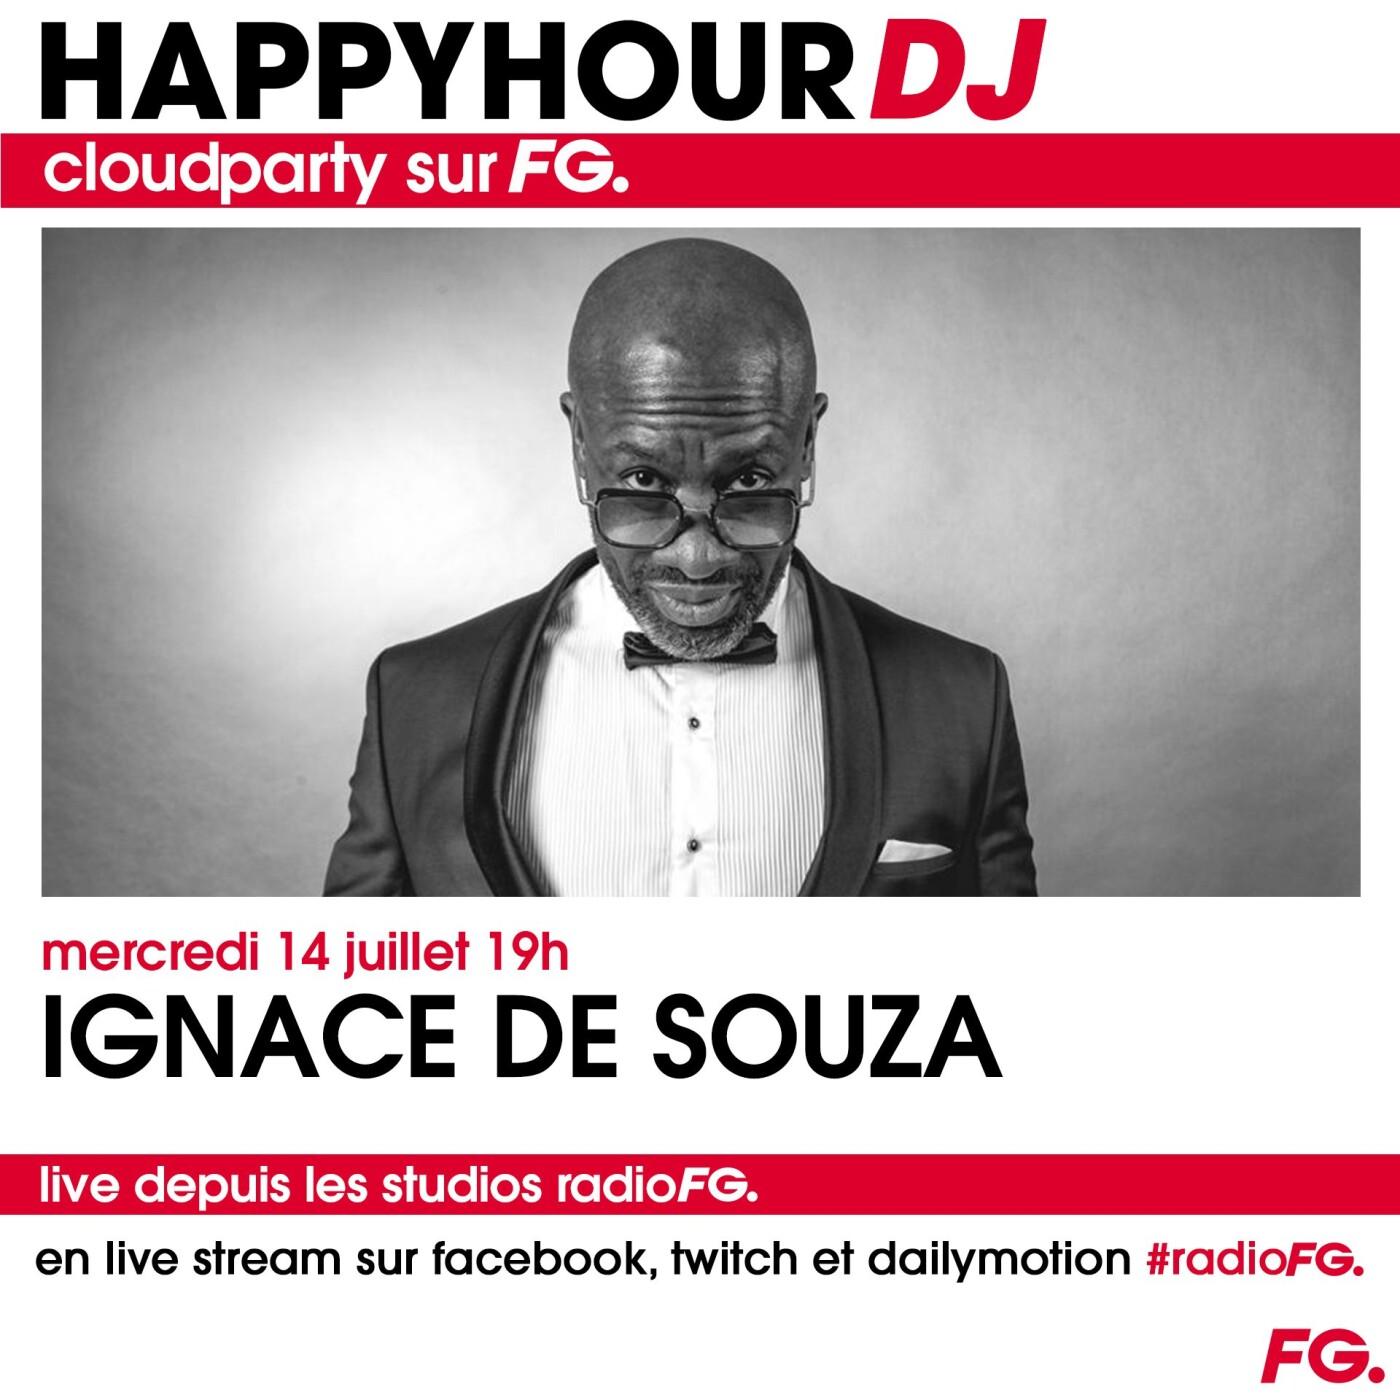 HAPPY HOUR DJ : IGNACE DE SOUZA